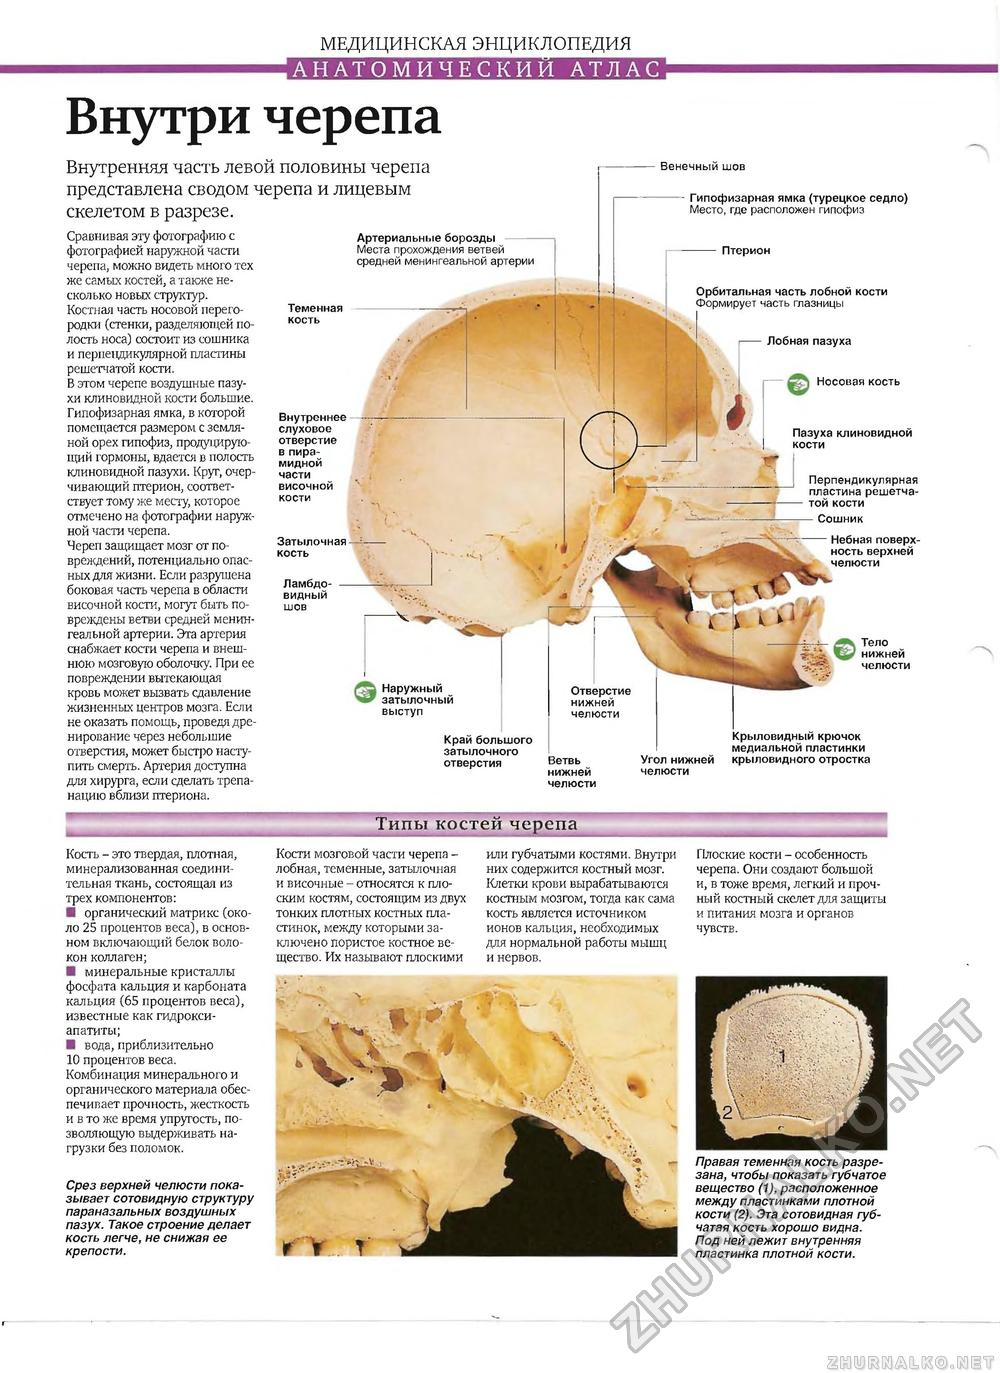 Малыш на приеме у невролога. Форма и размер 25